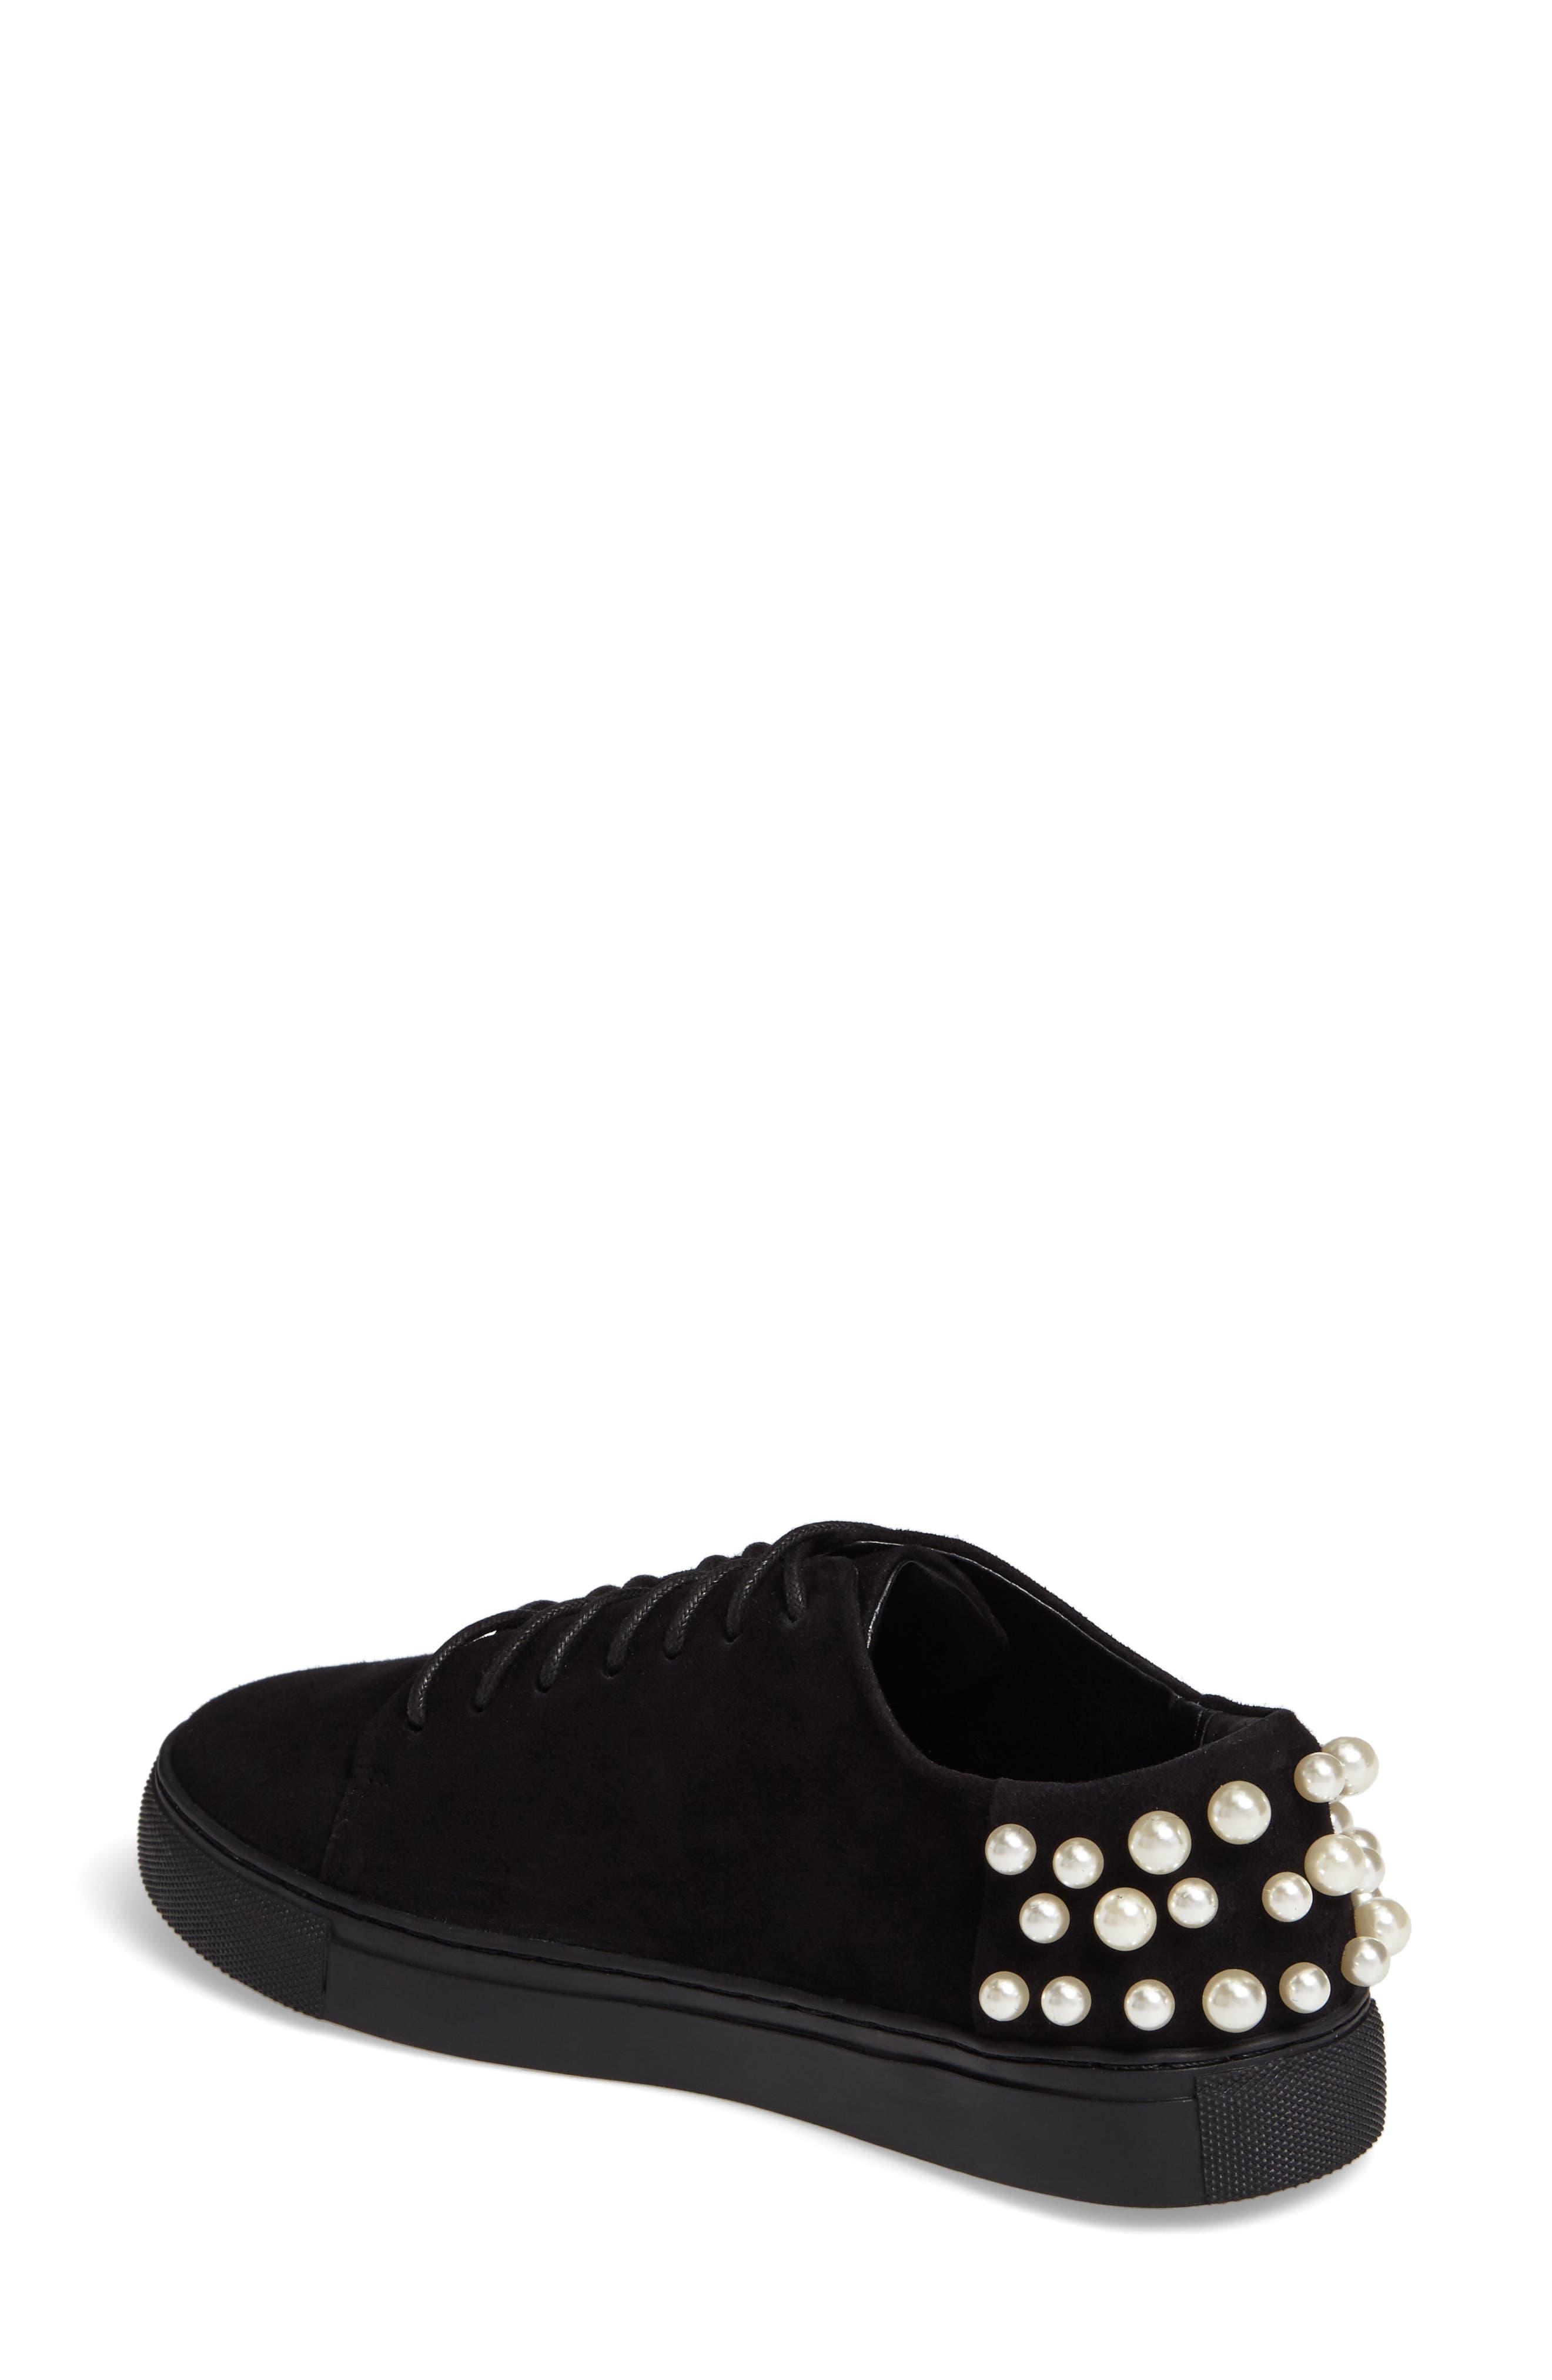 Haig Embellished Sneaker,                             Alternate thumbnail 2, color,                             Black